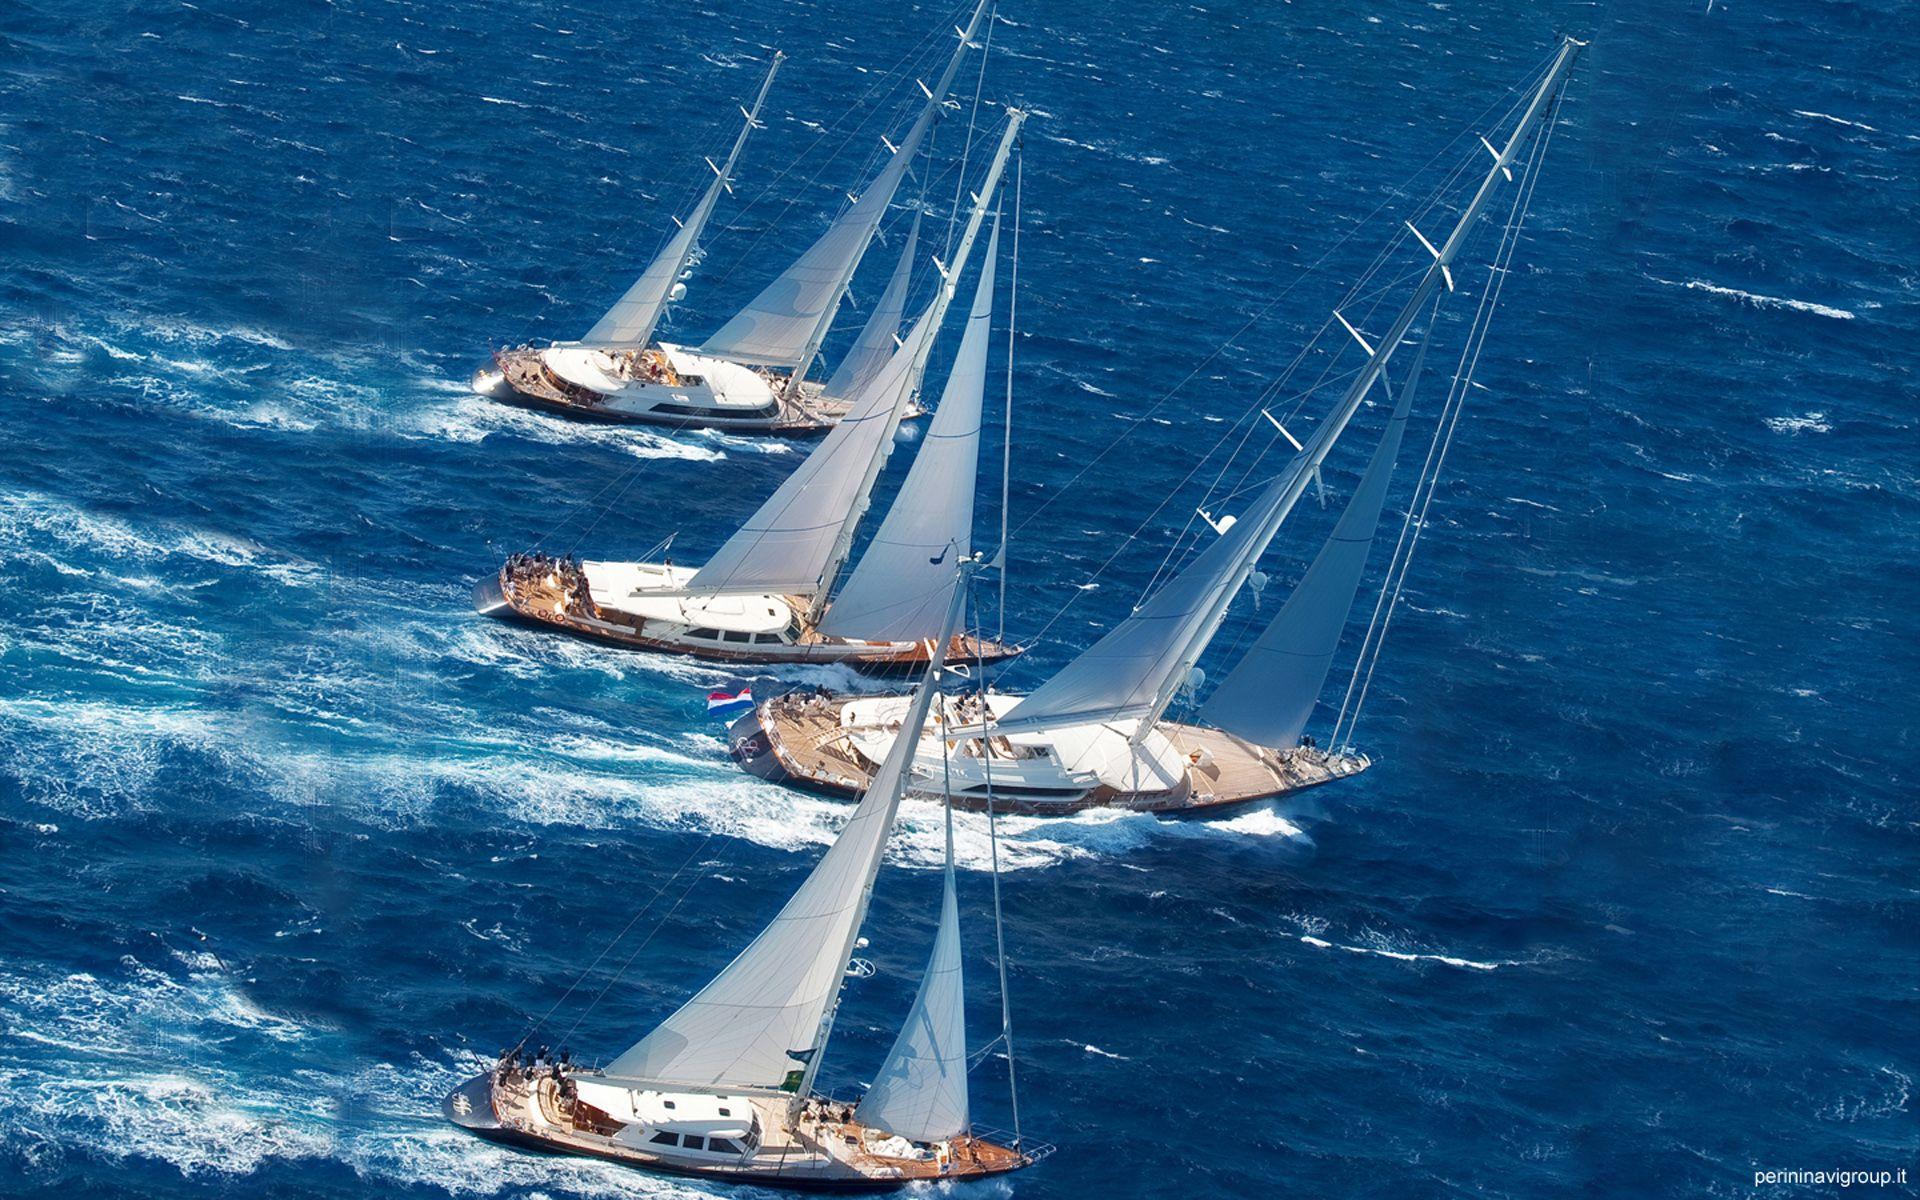 Perini Navi Cup Boat, Sailing, Power boats